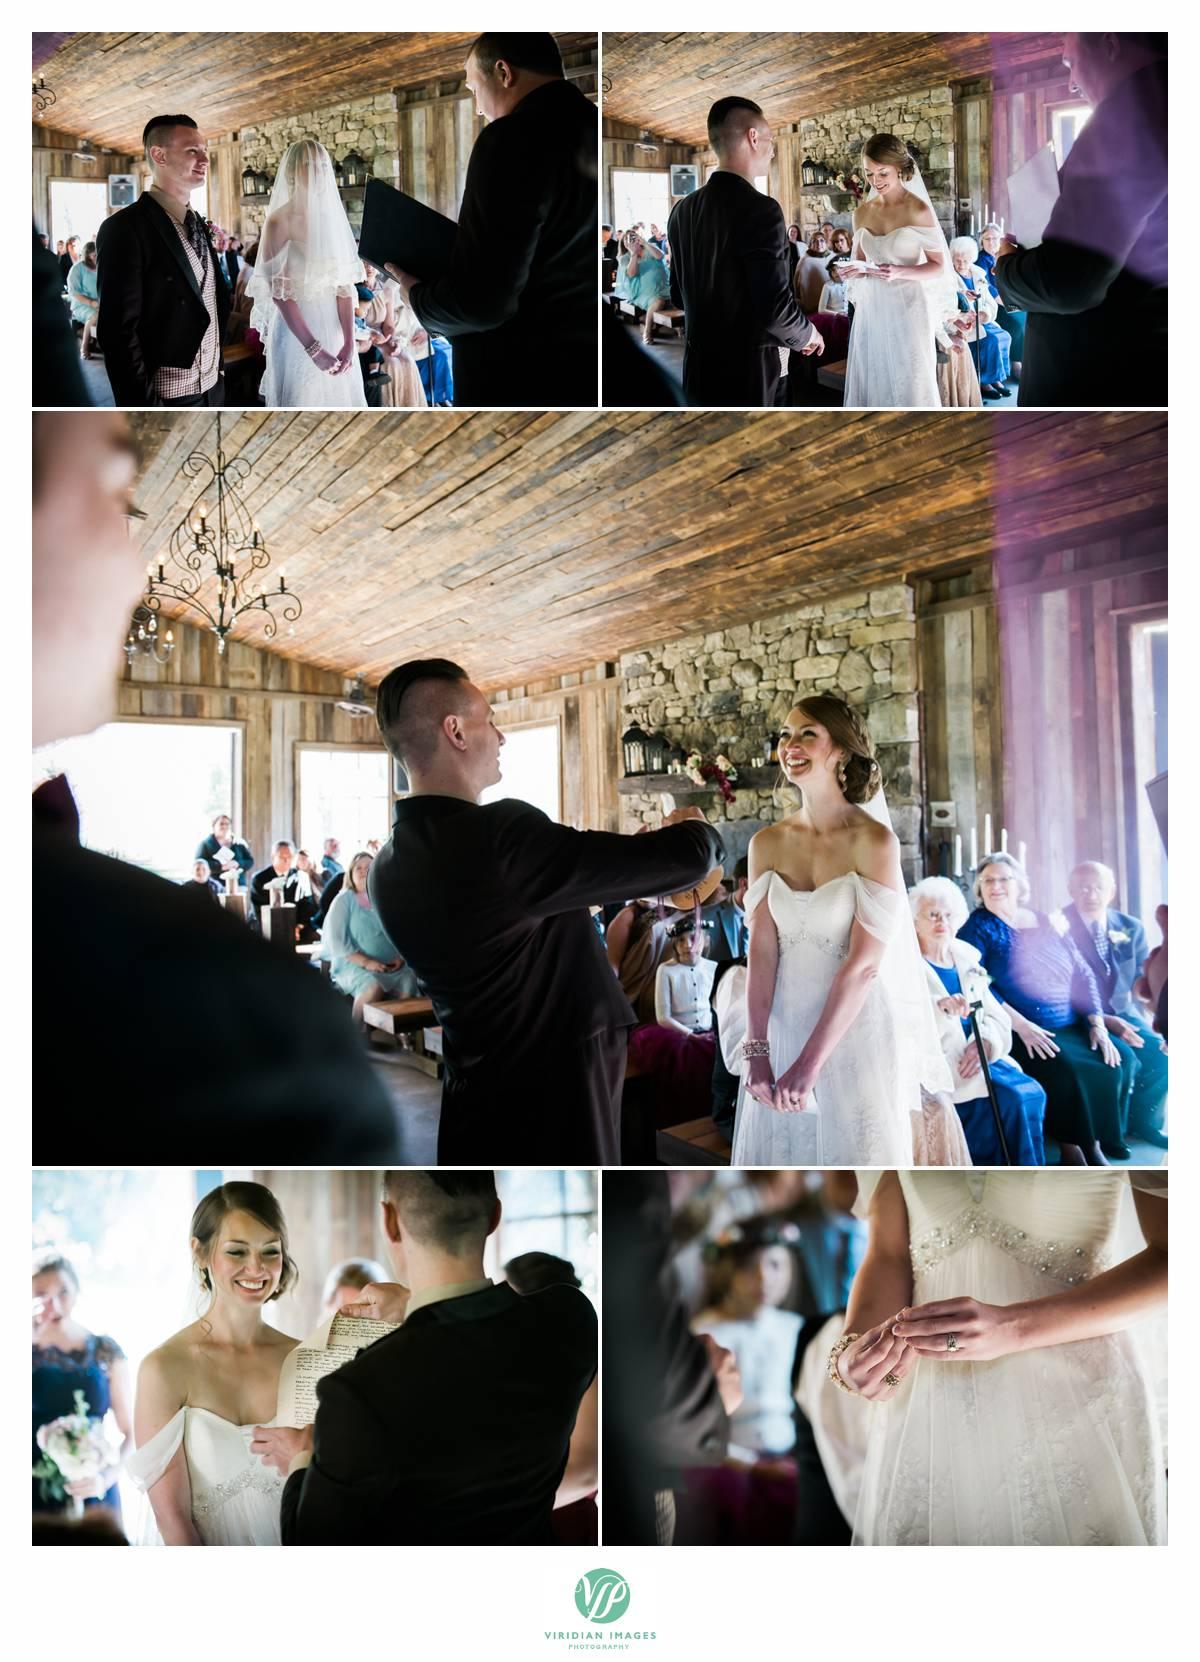 Retreat-at-Hiawassee-river-wedding-Viridian-Images-Photography 19